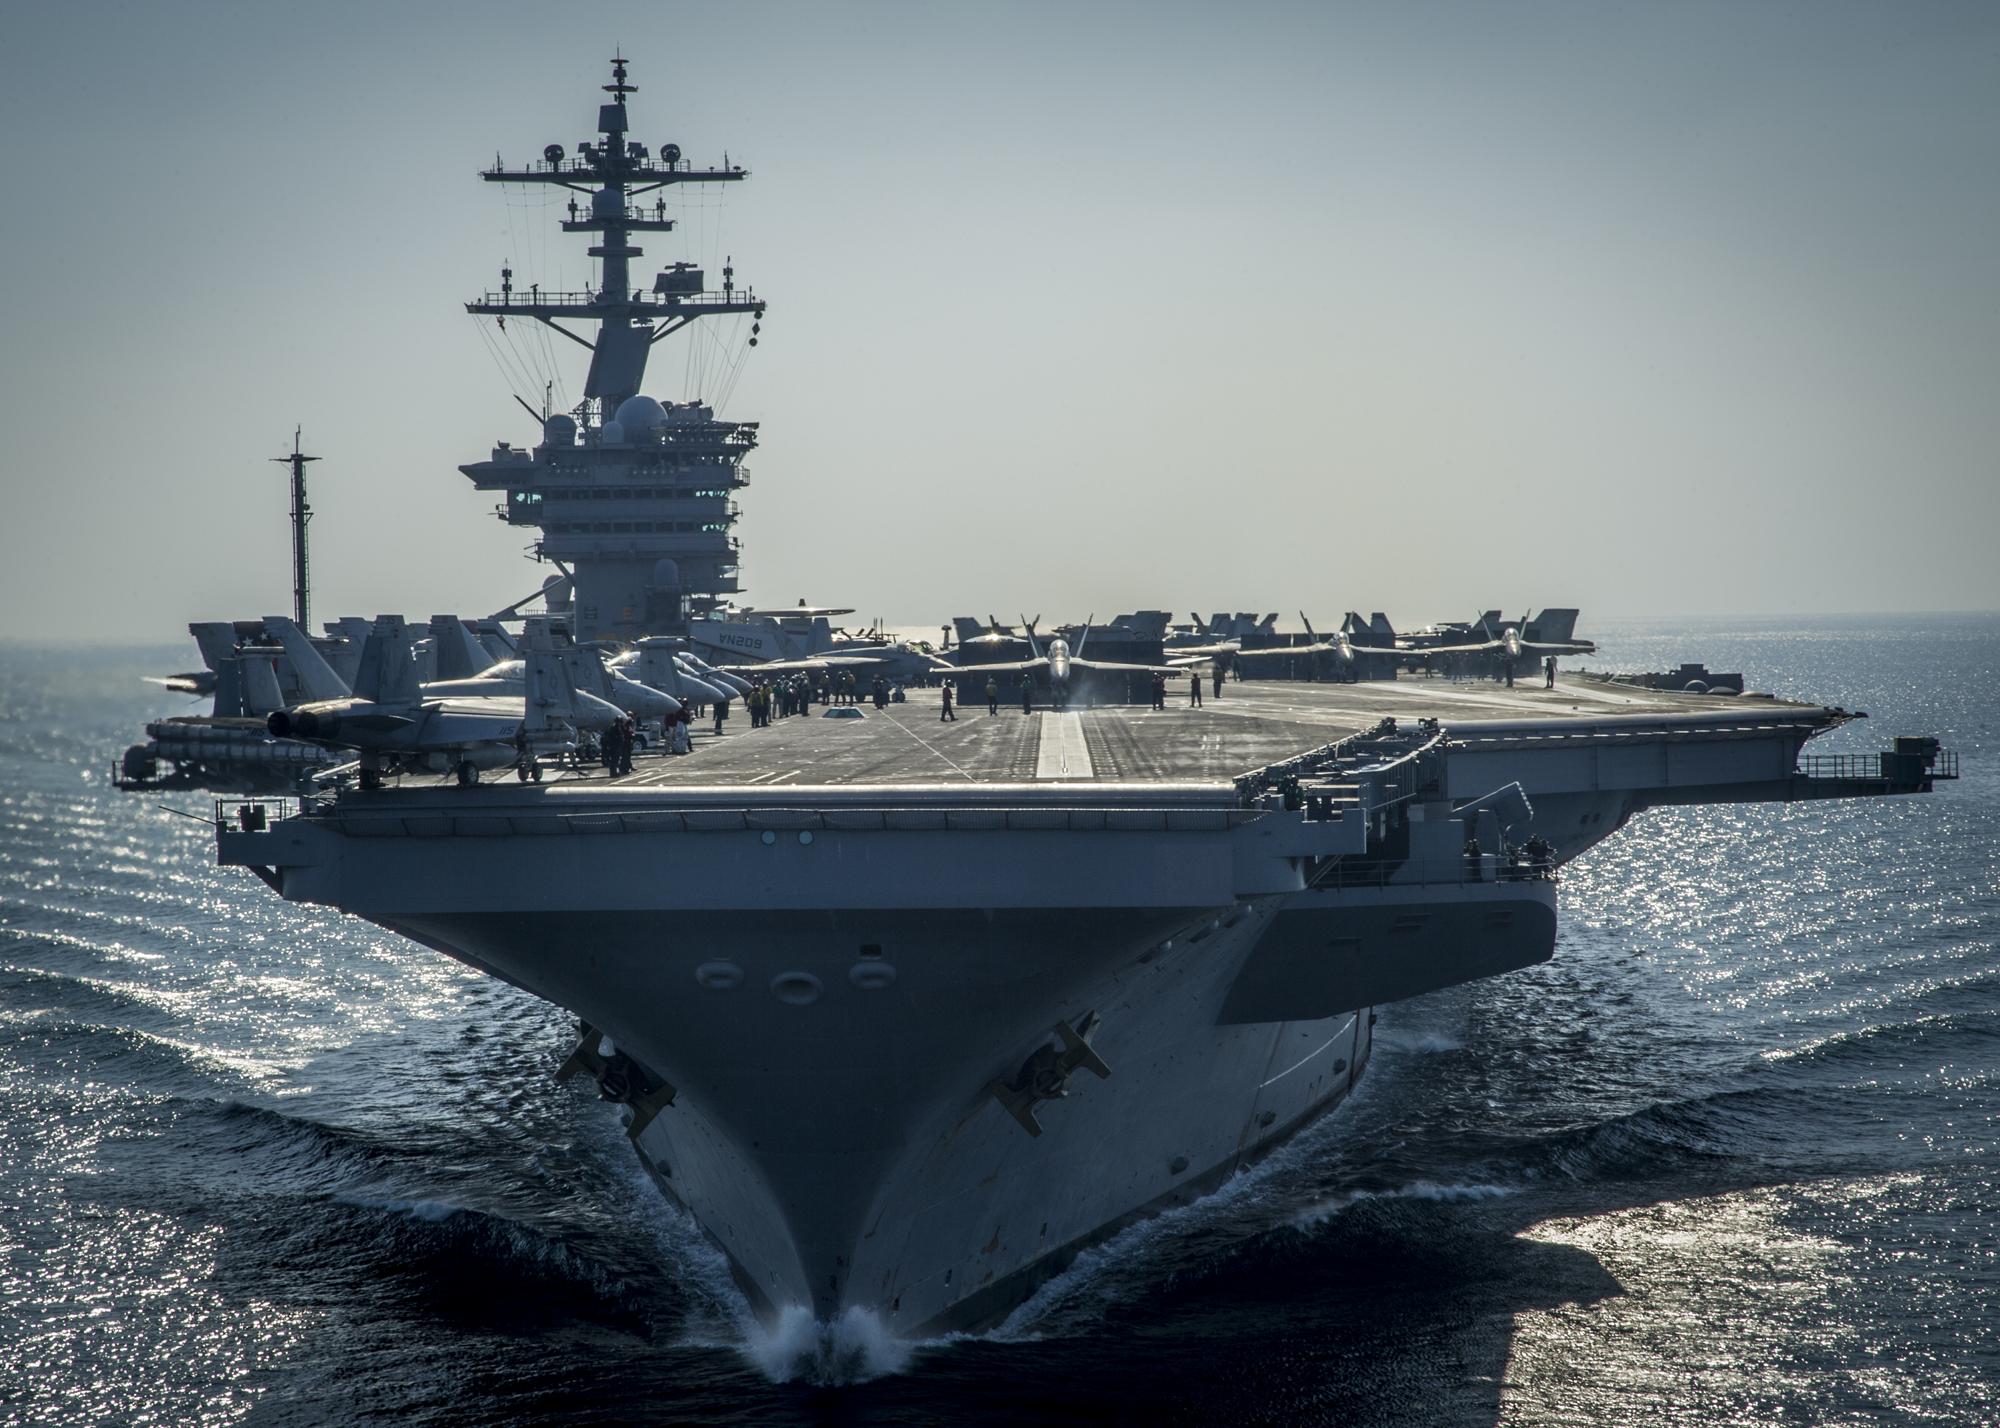 USS CARL VINSON CVN-70 am 08.12.2014 im Arabischen Meer Bild: U.S. Navy